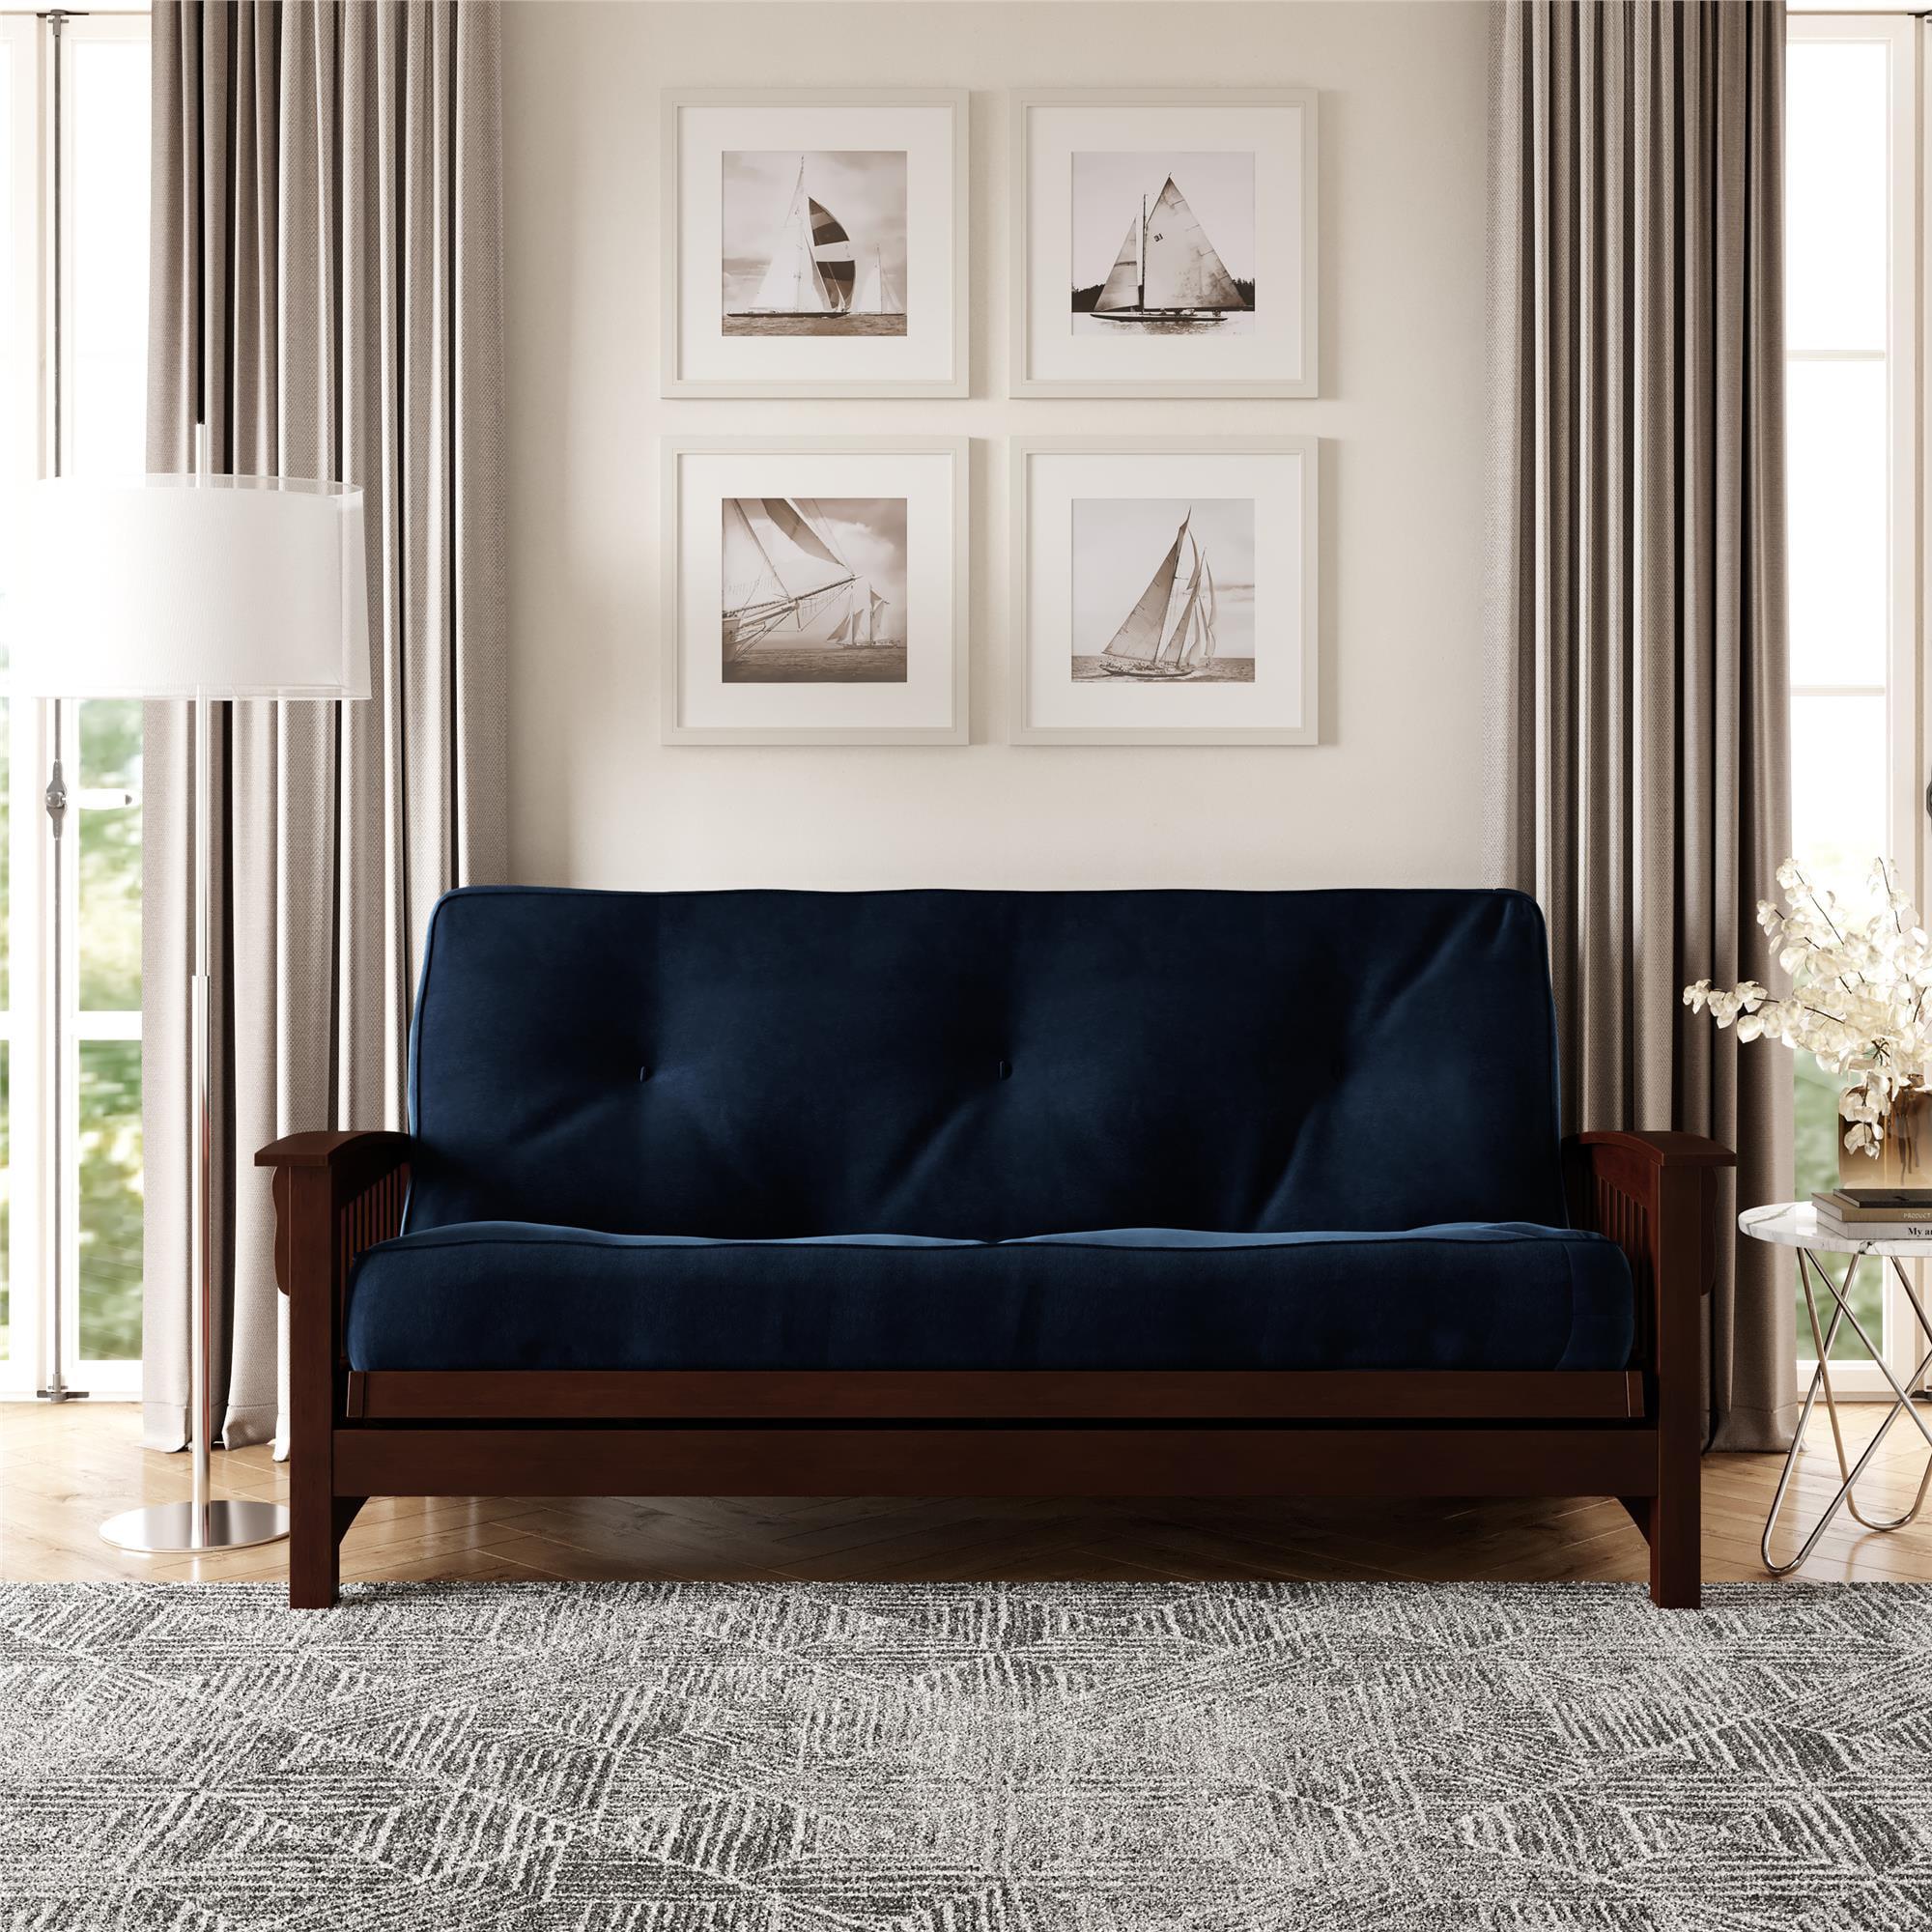 Dhp 8 Inch Independently Encased Coil Futon Mattress Blue Microfiber Walmart Com Walmart Com